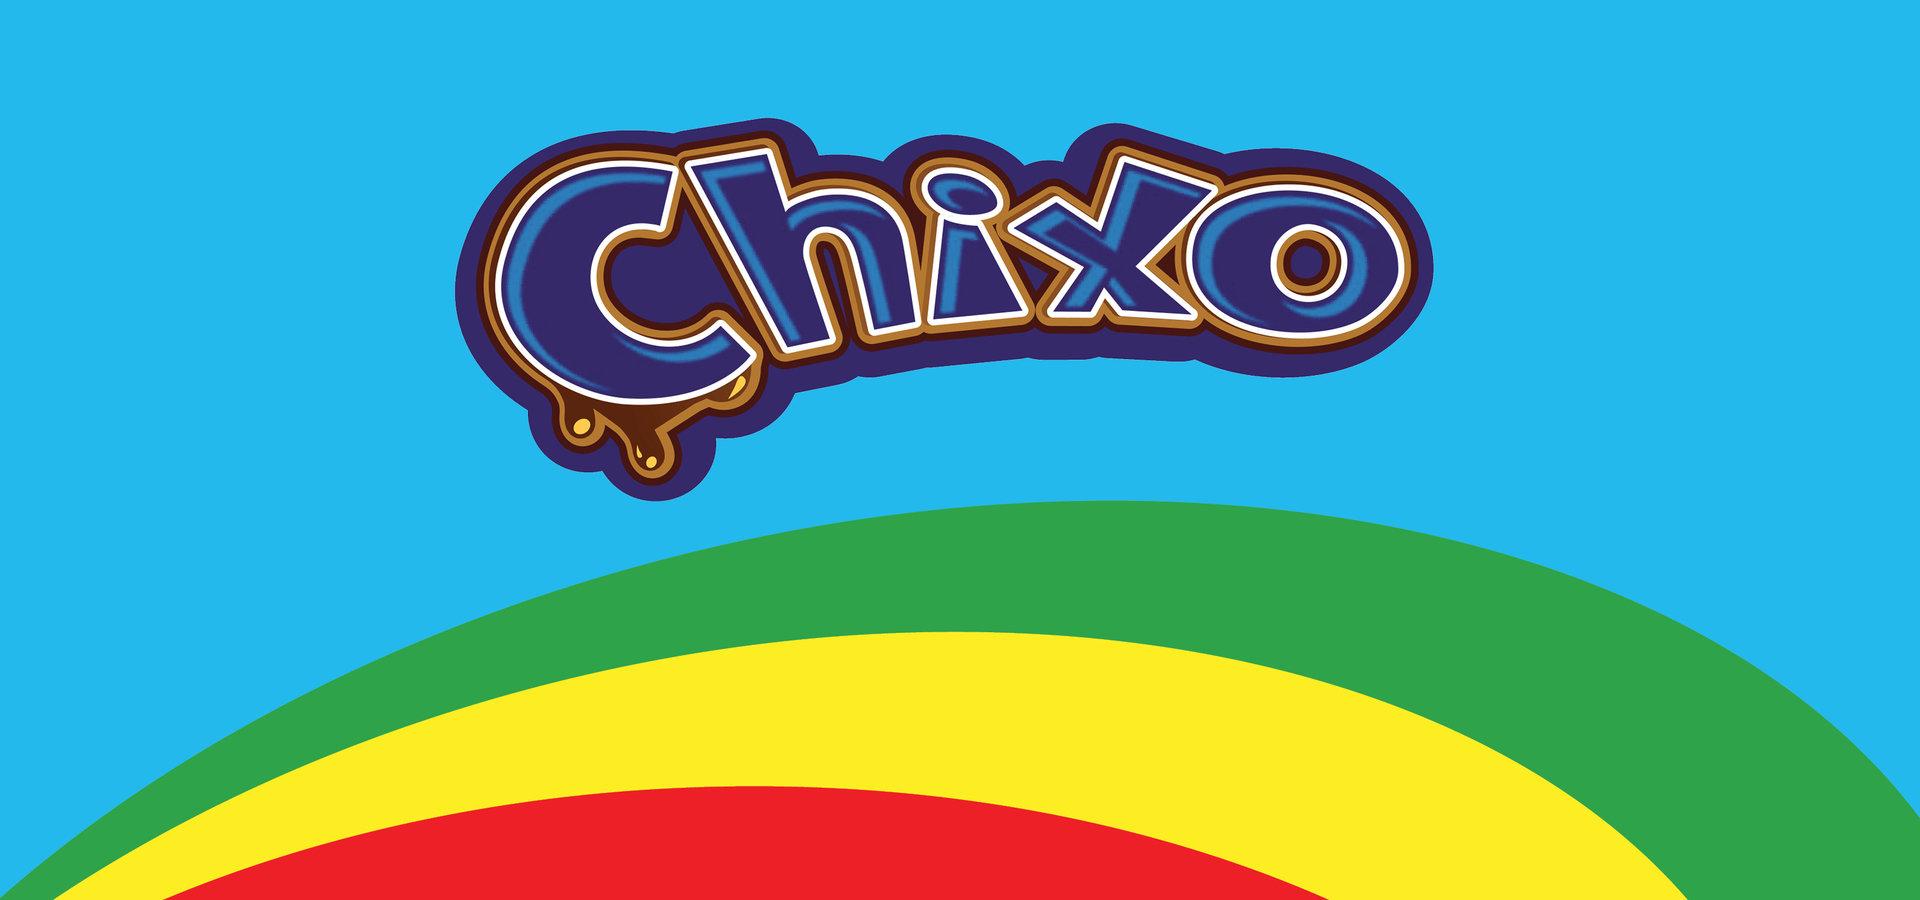 Cadbury launches fun filled soft chocolate, Chixo